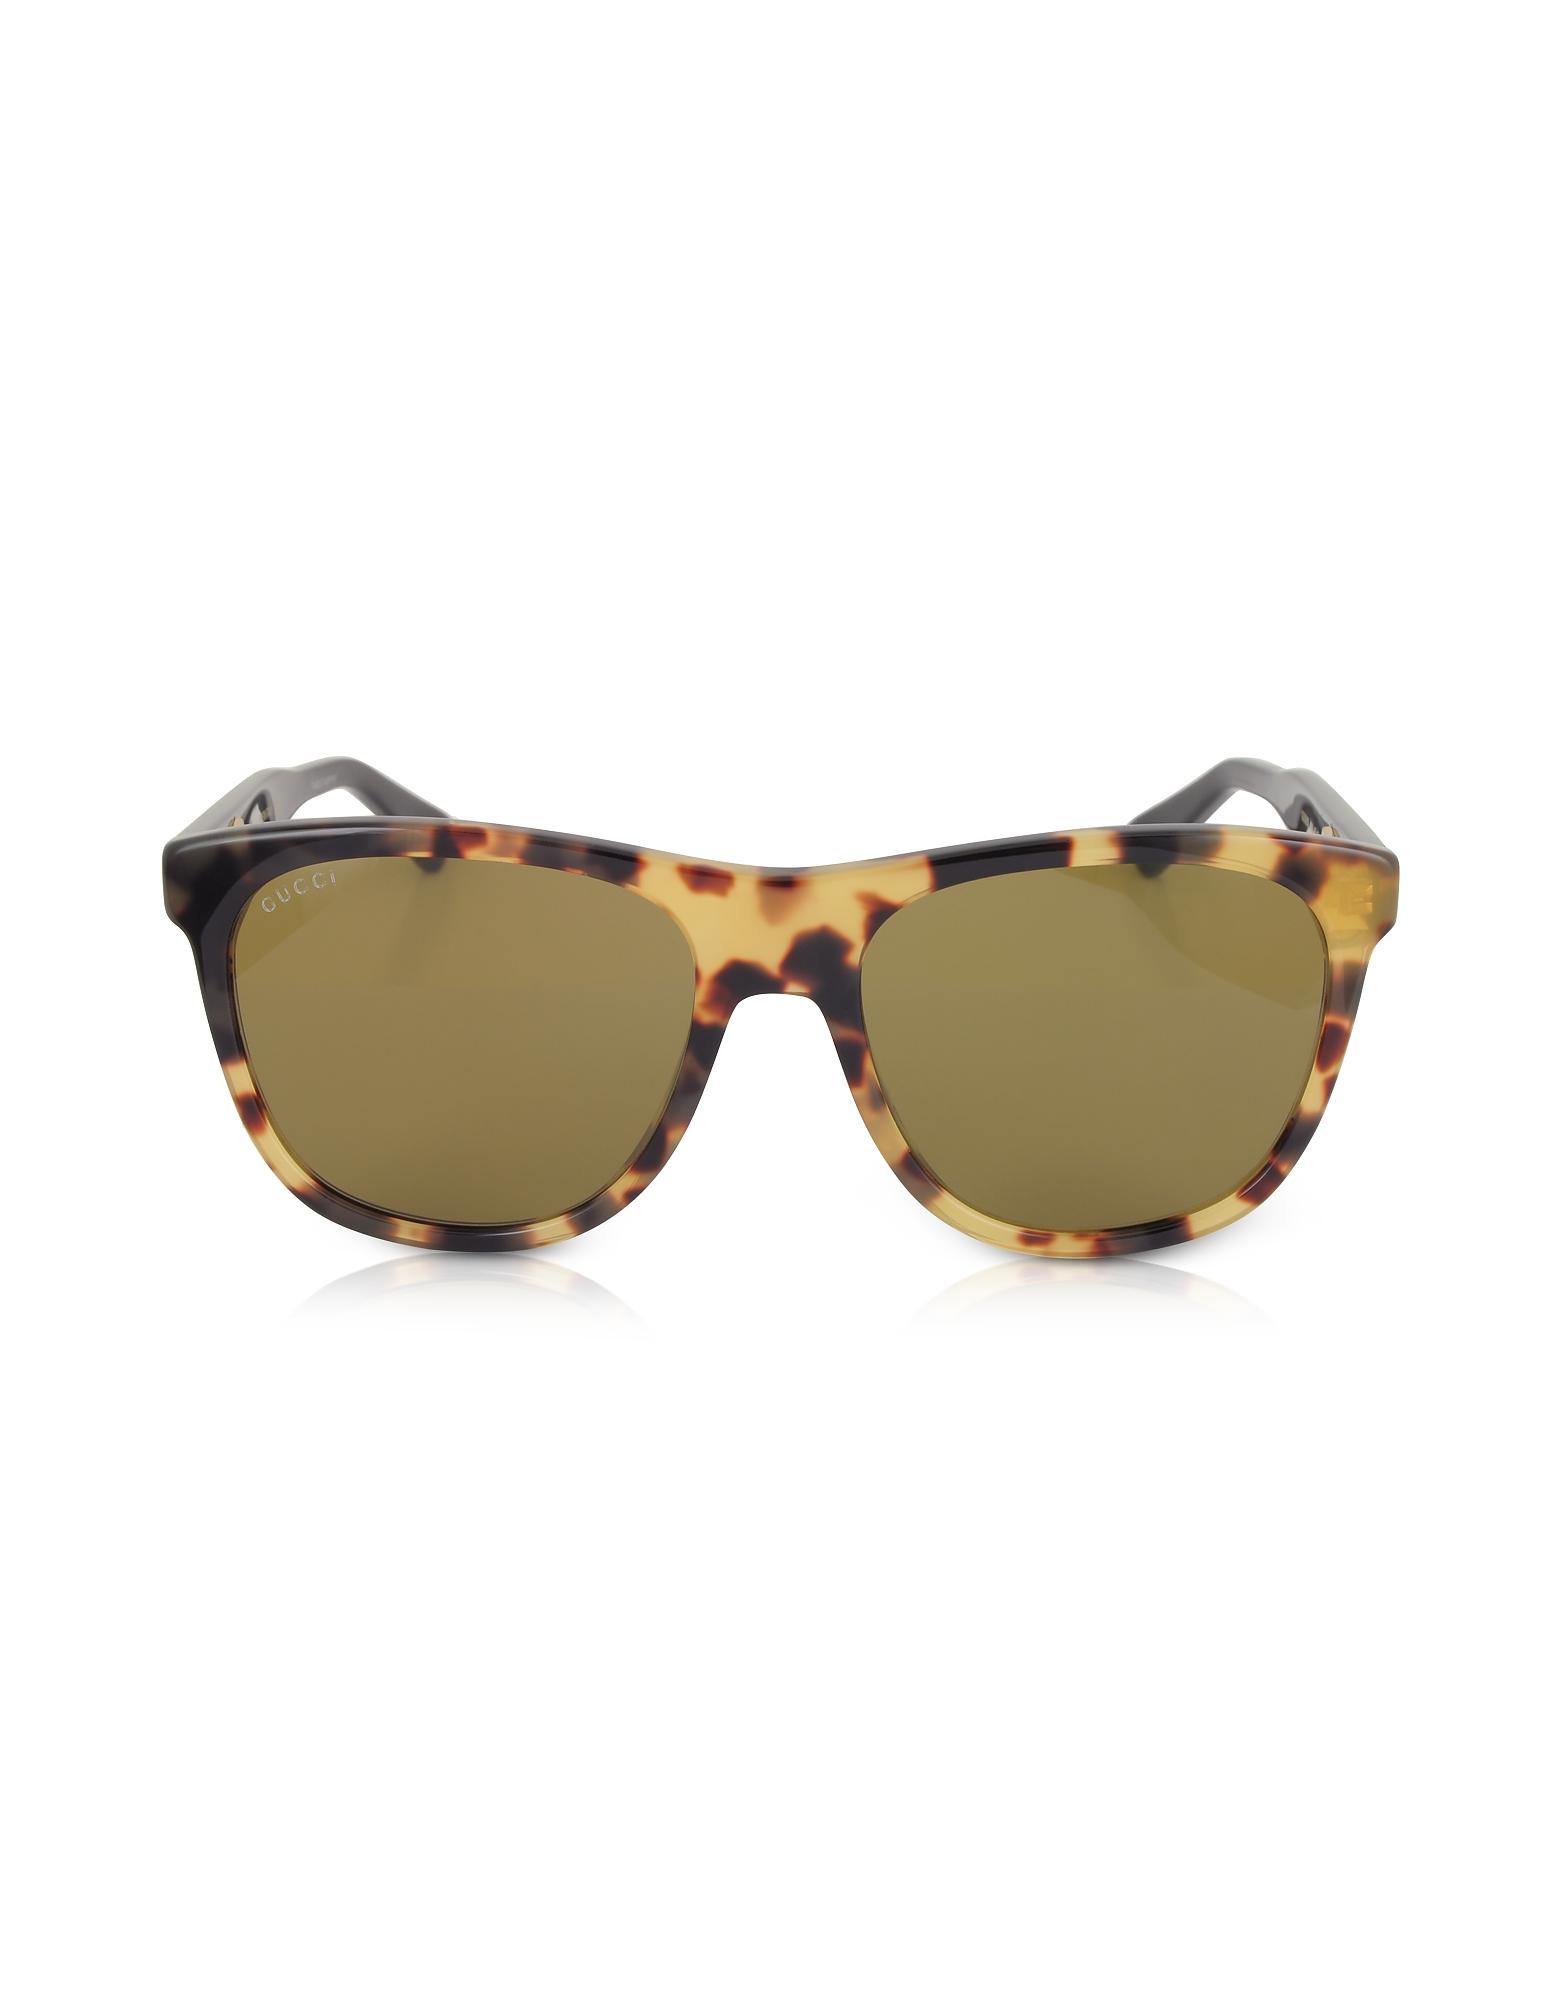 GG0266S Squared-frame Havana Brown Sunglasses w/Polarized Lenses